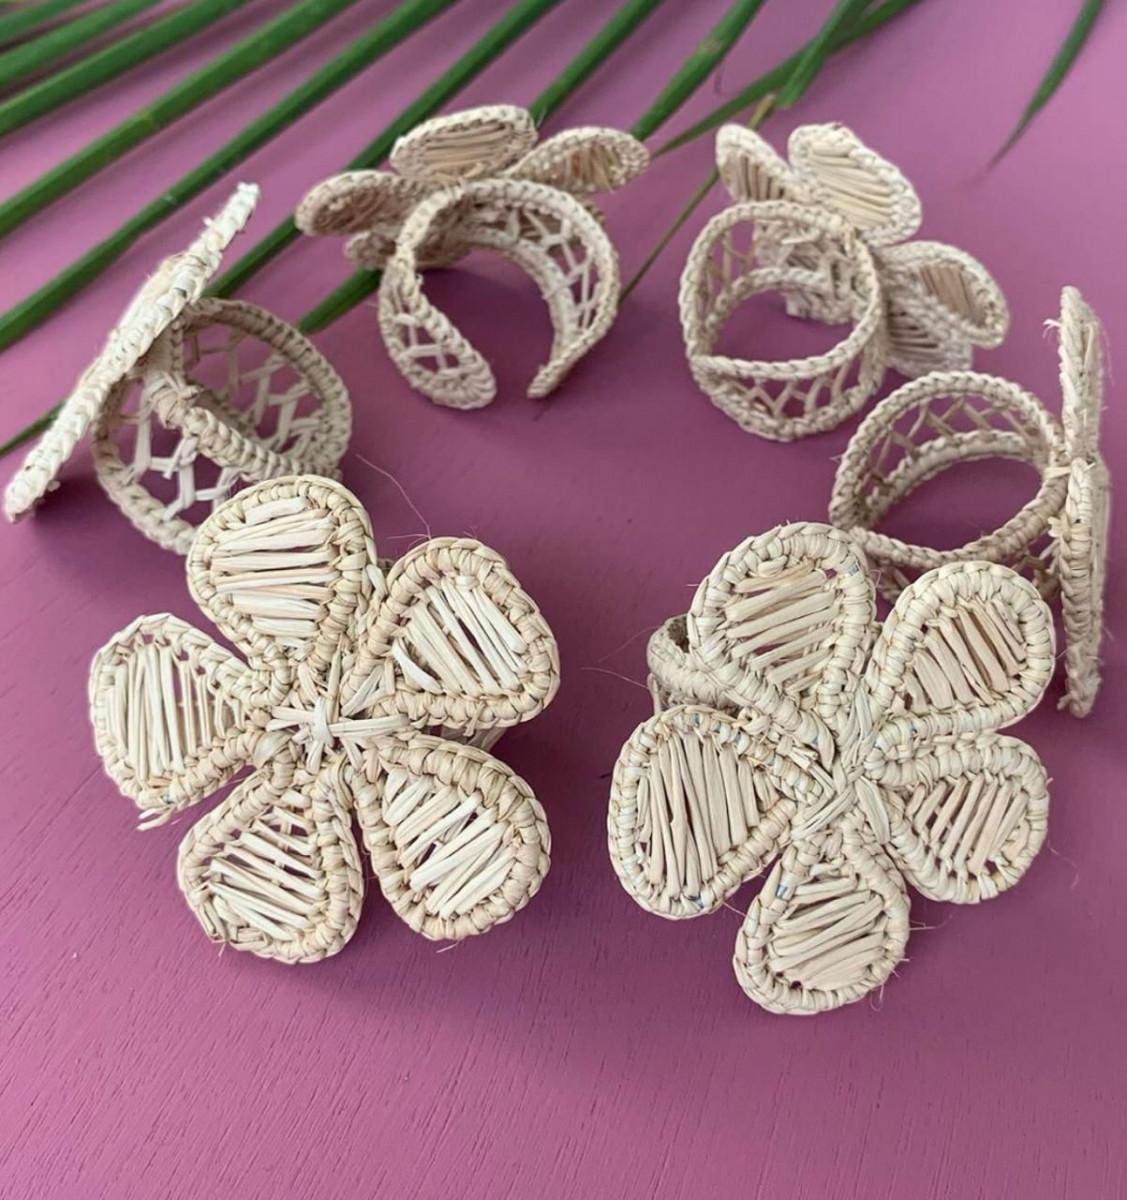 Iraca Woven Napkin Rings